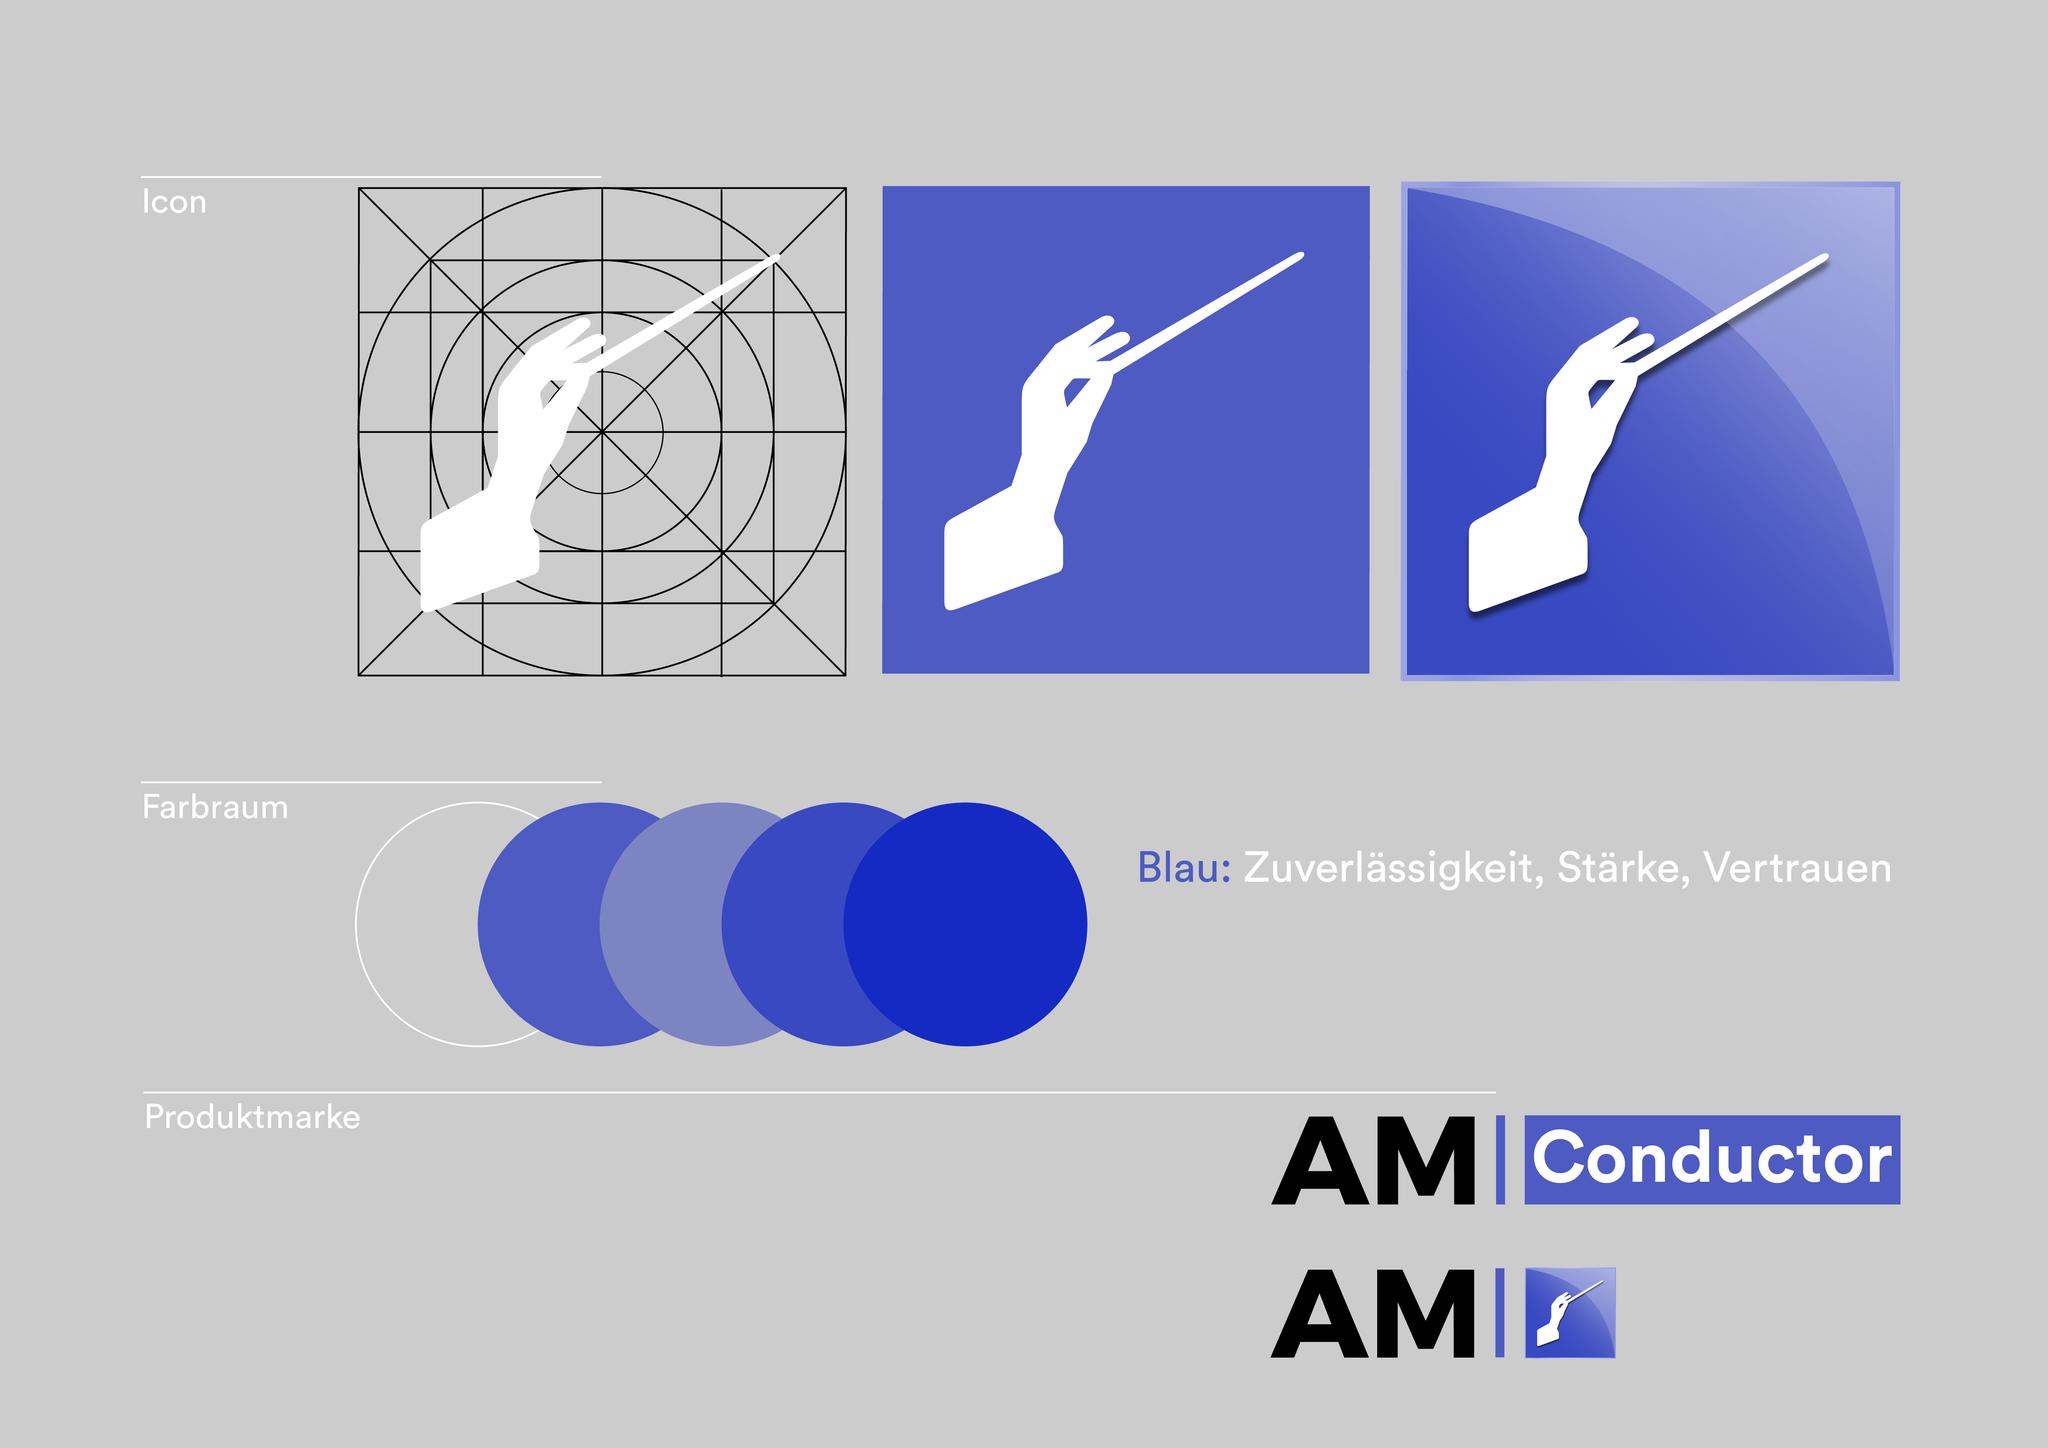 Produkt AM Conductor